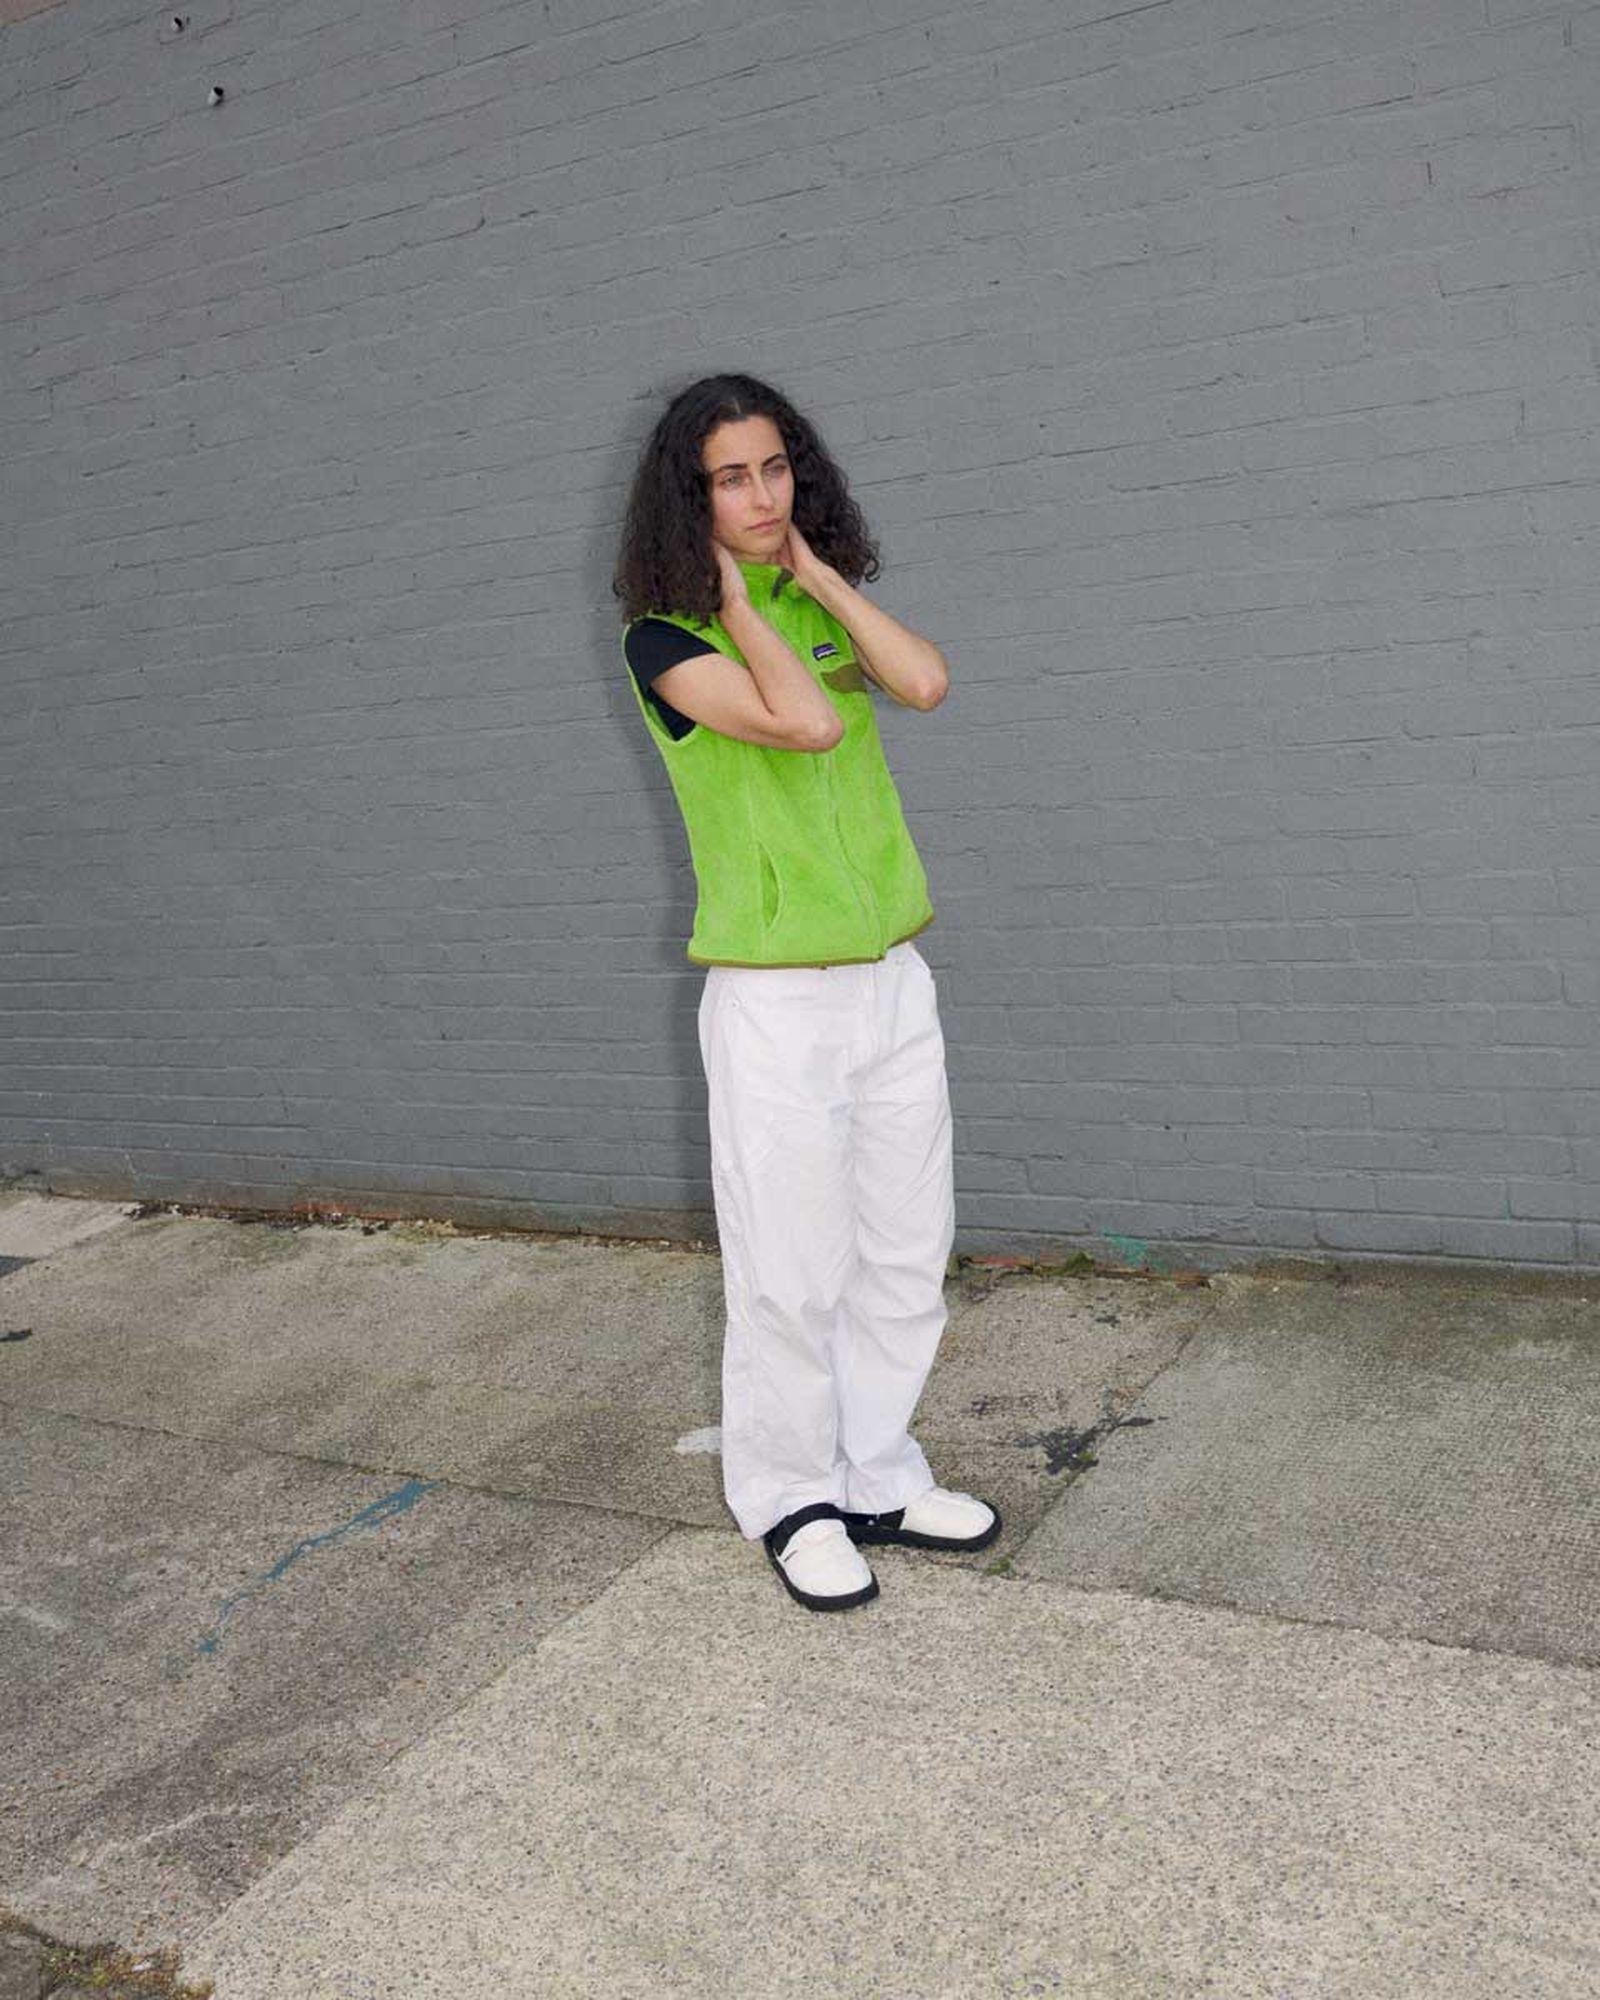 reebok beatnik primaloft pack quilted sandal buy release date info colorway GW8326 GW8327 GW8328